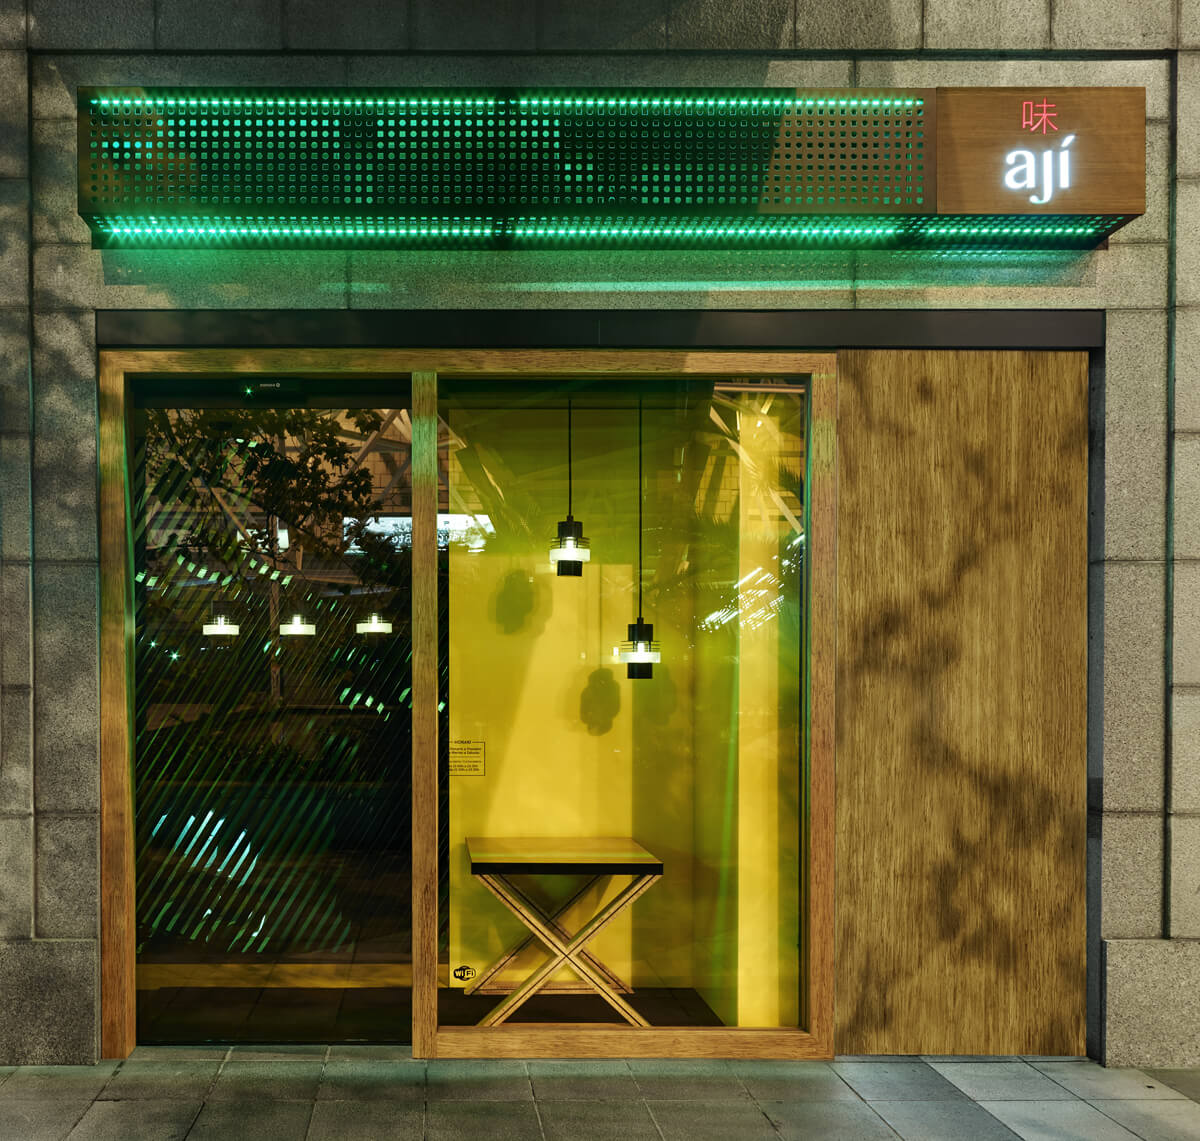 fugrup-restaurante-aji-barcelona-12